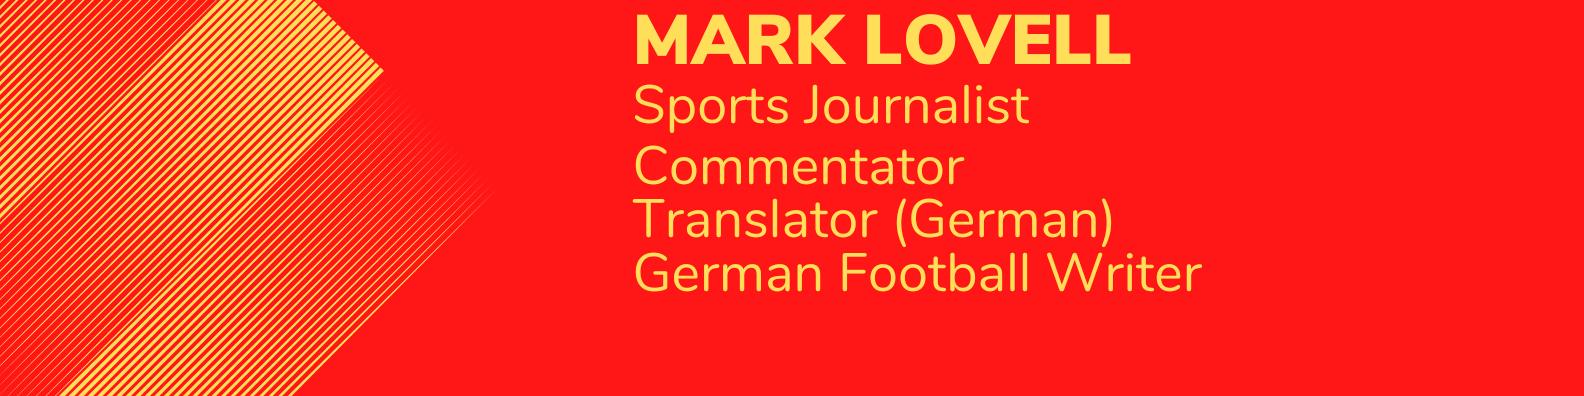 Mark Lovell - German Football Writer